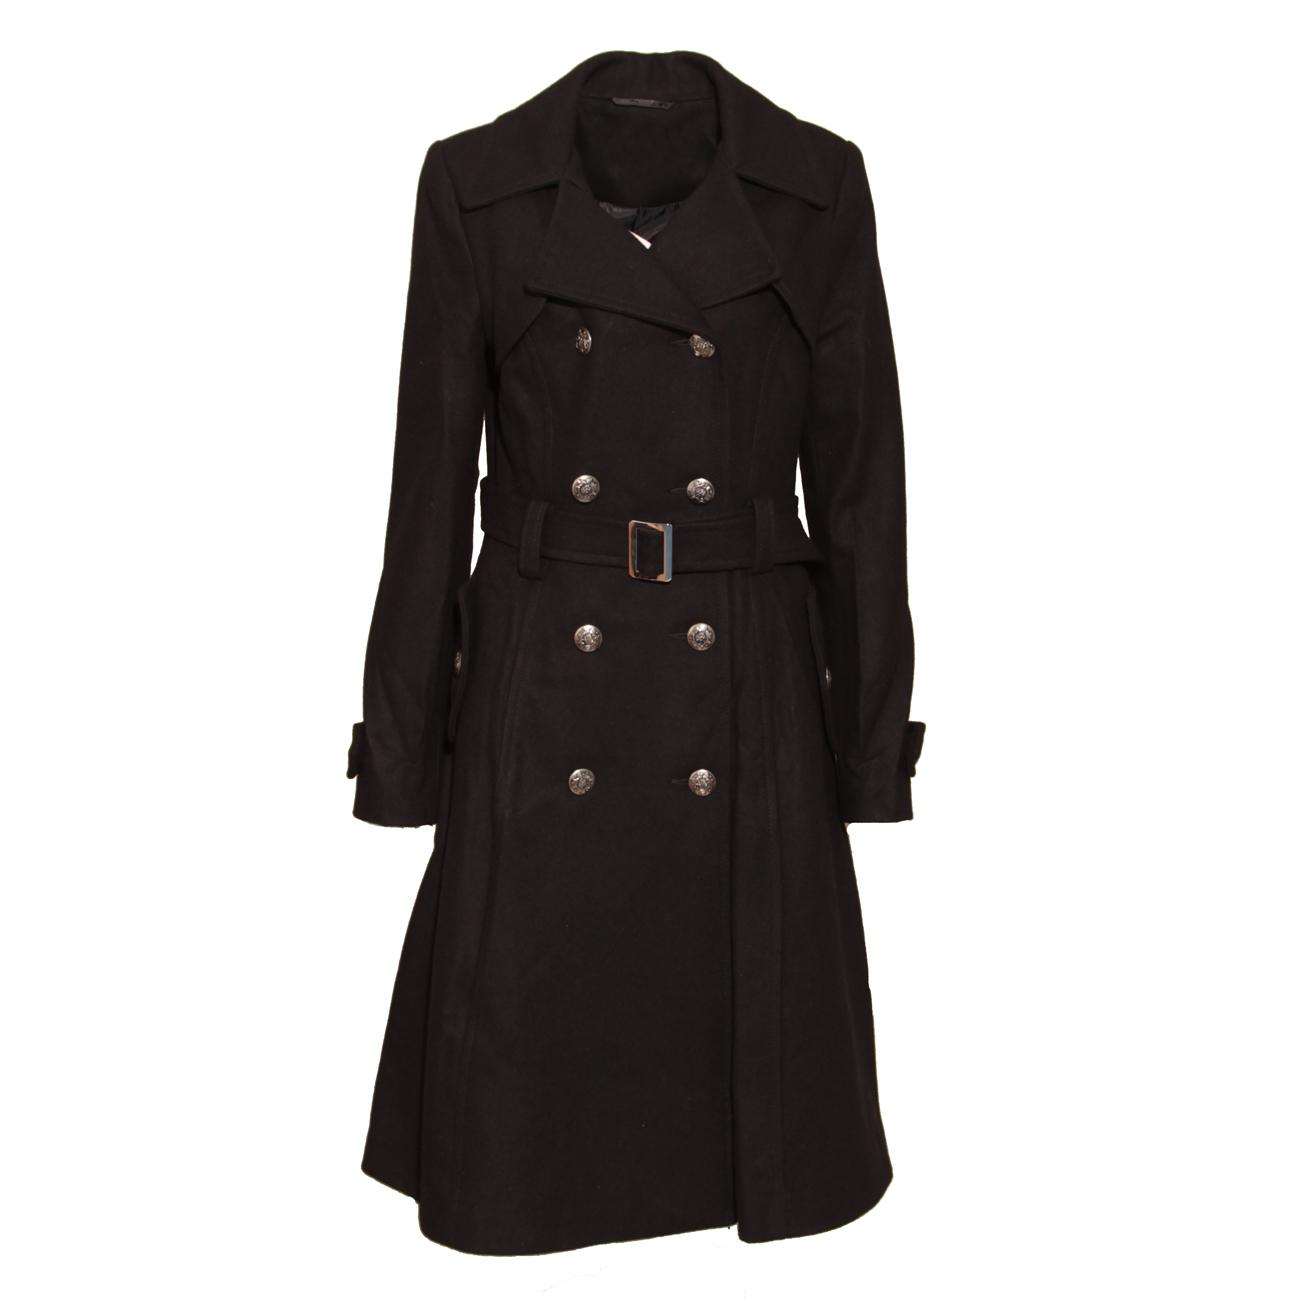 Military womens coat